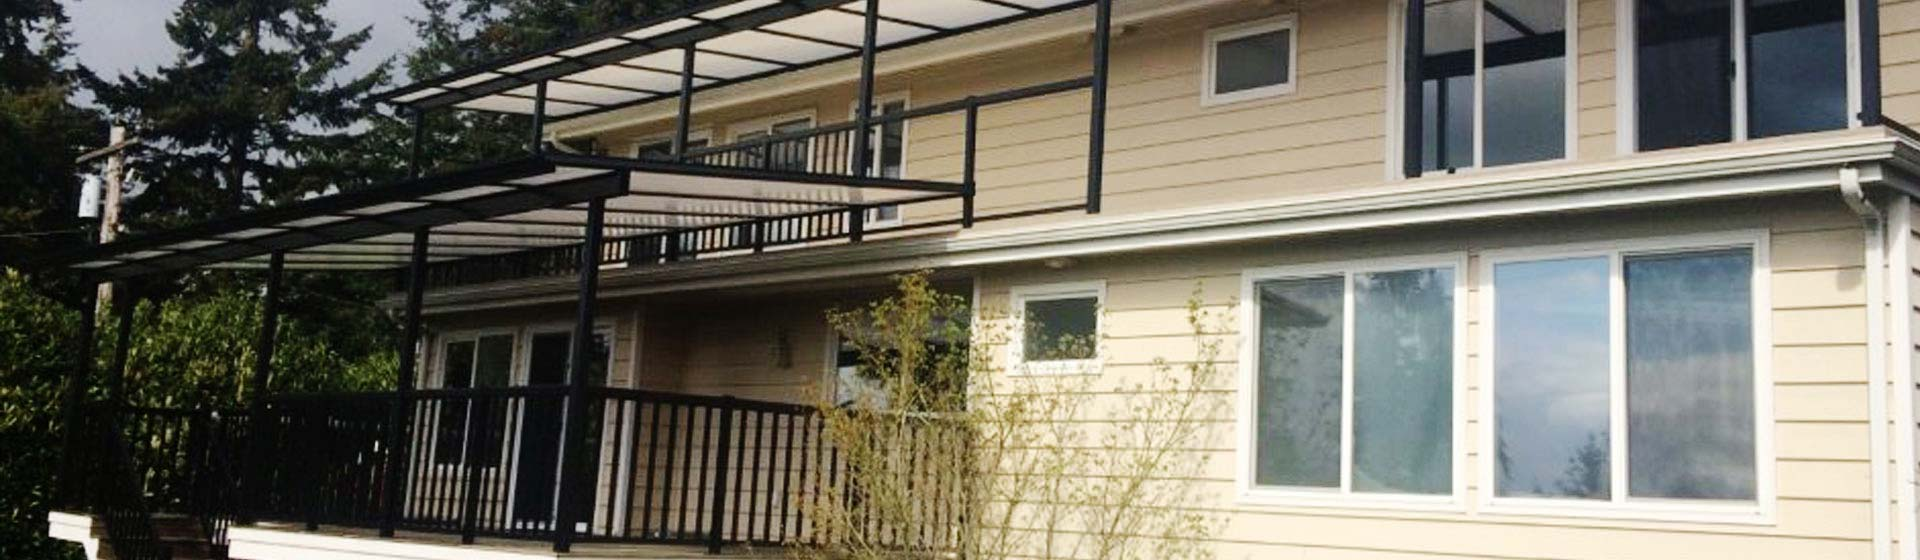 integrated-railings